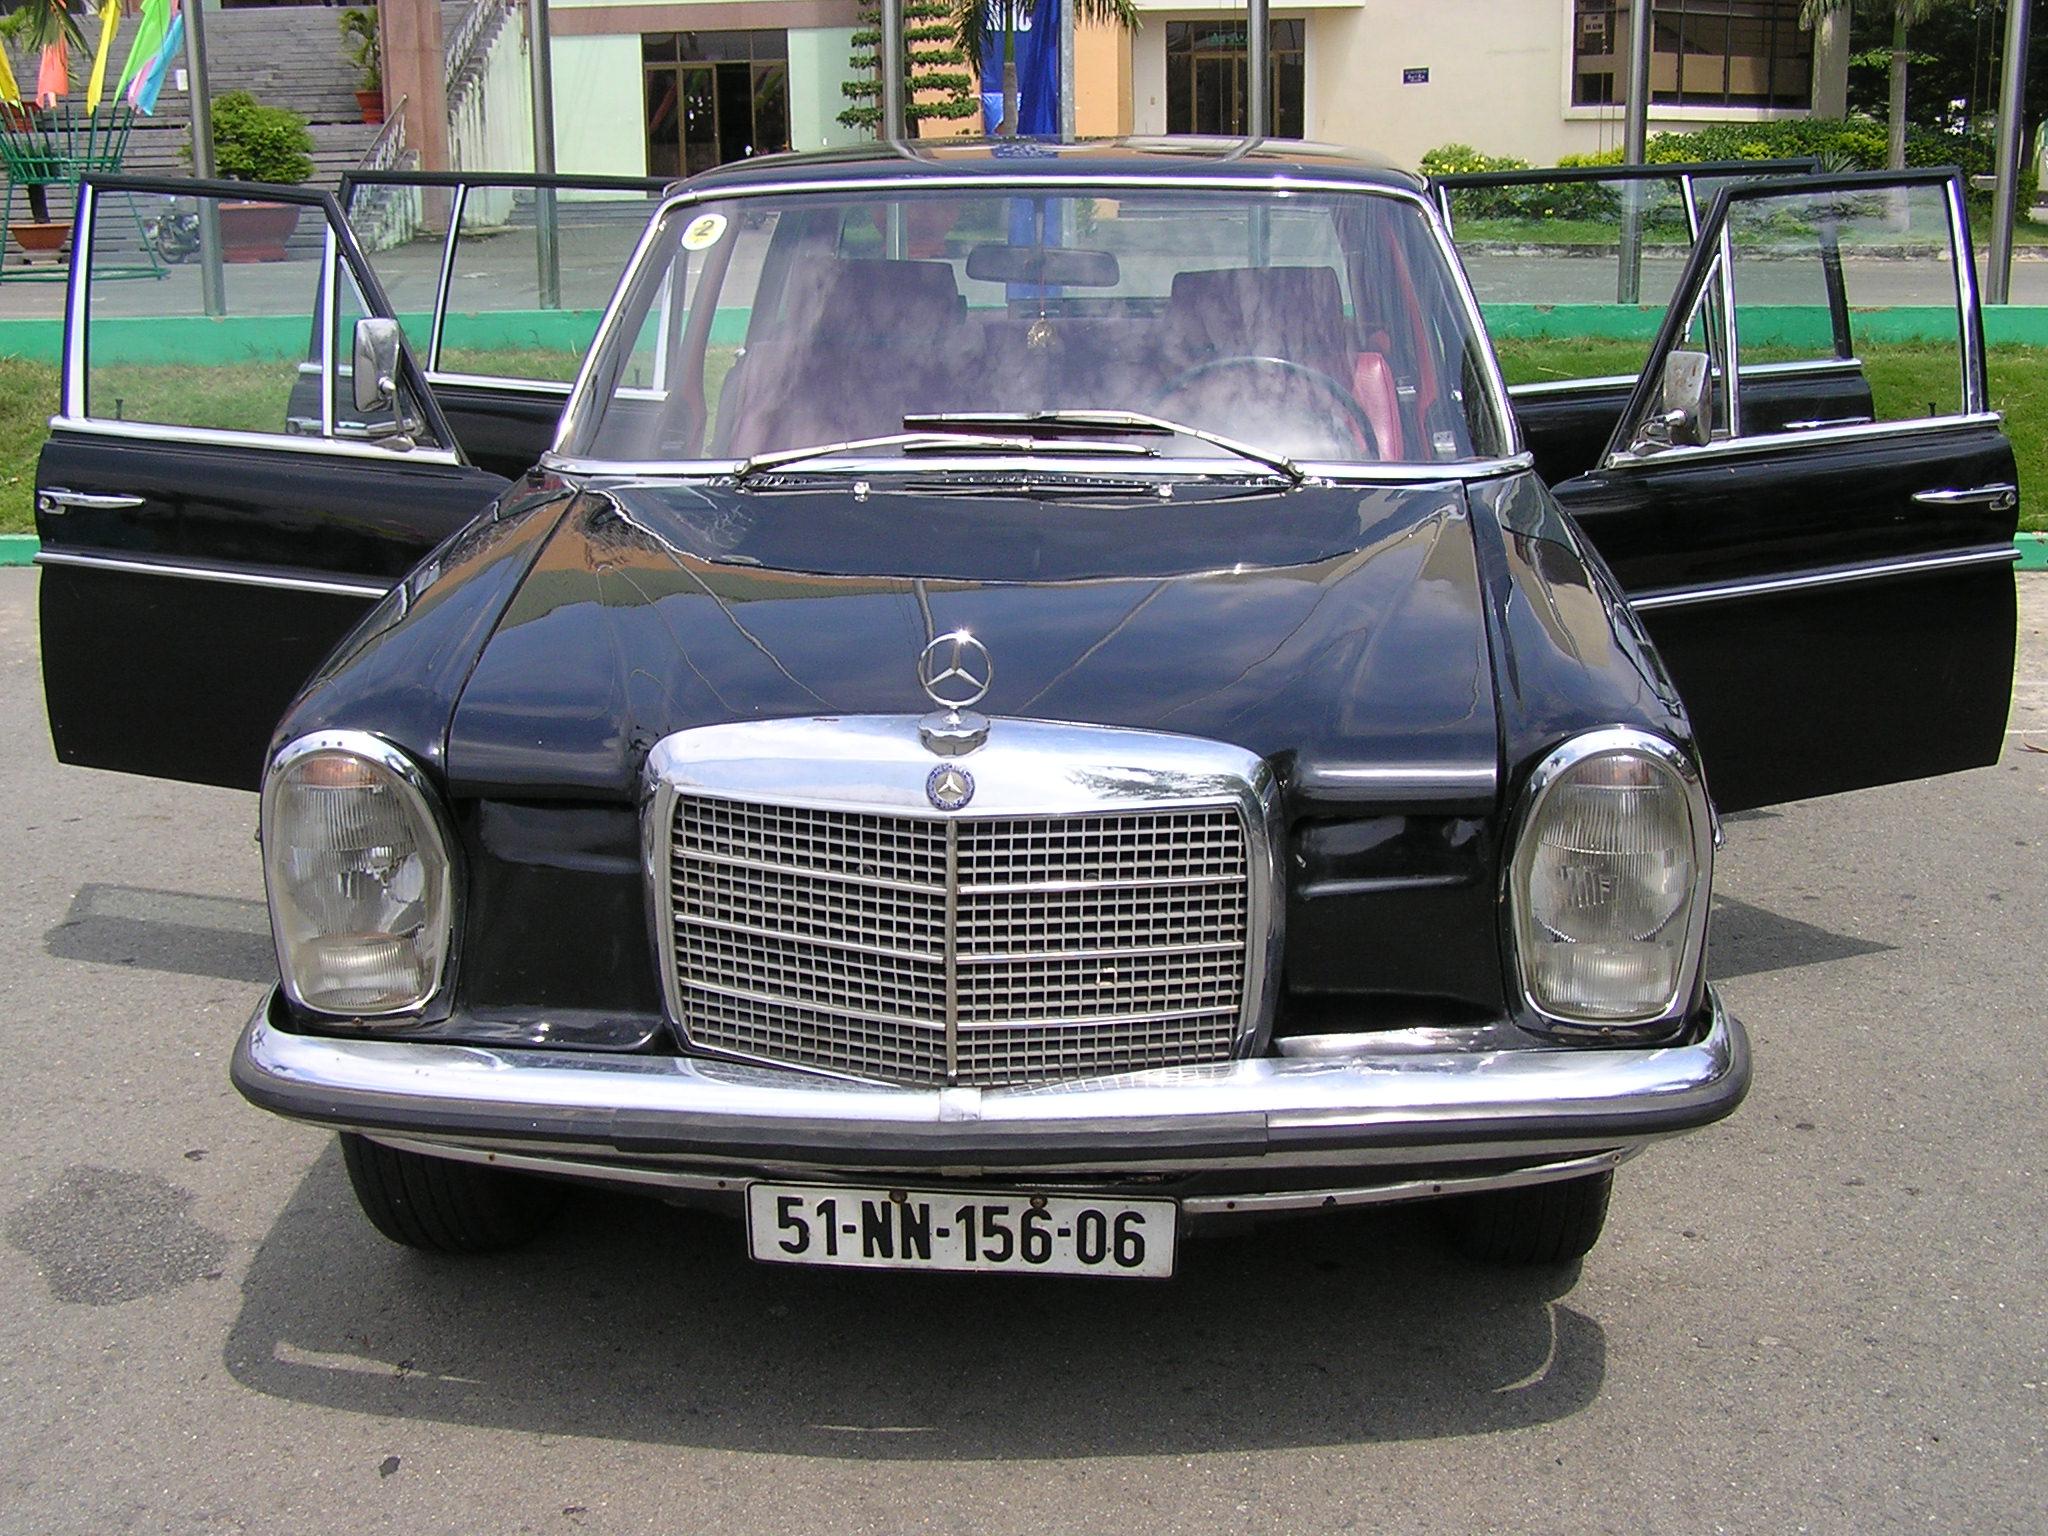 Trai-nghiem-qua-khu-ngot-ngao-tren-Mercedes-Benz-Limousine-230E-1969-anh-30